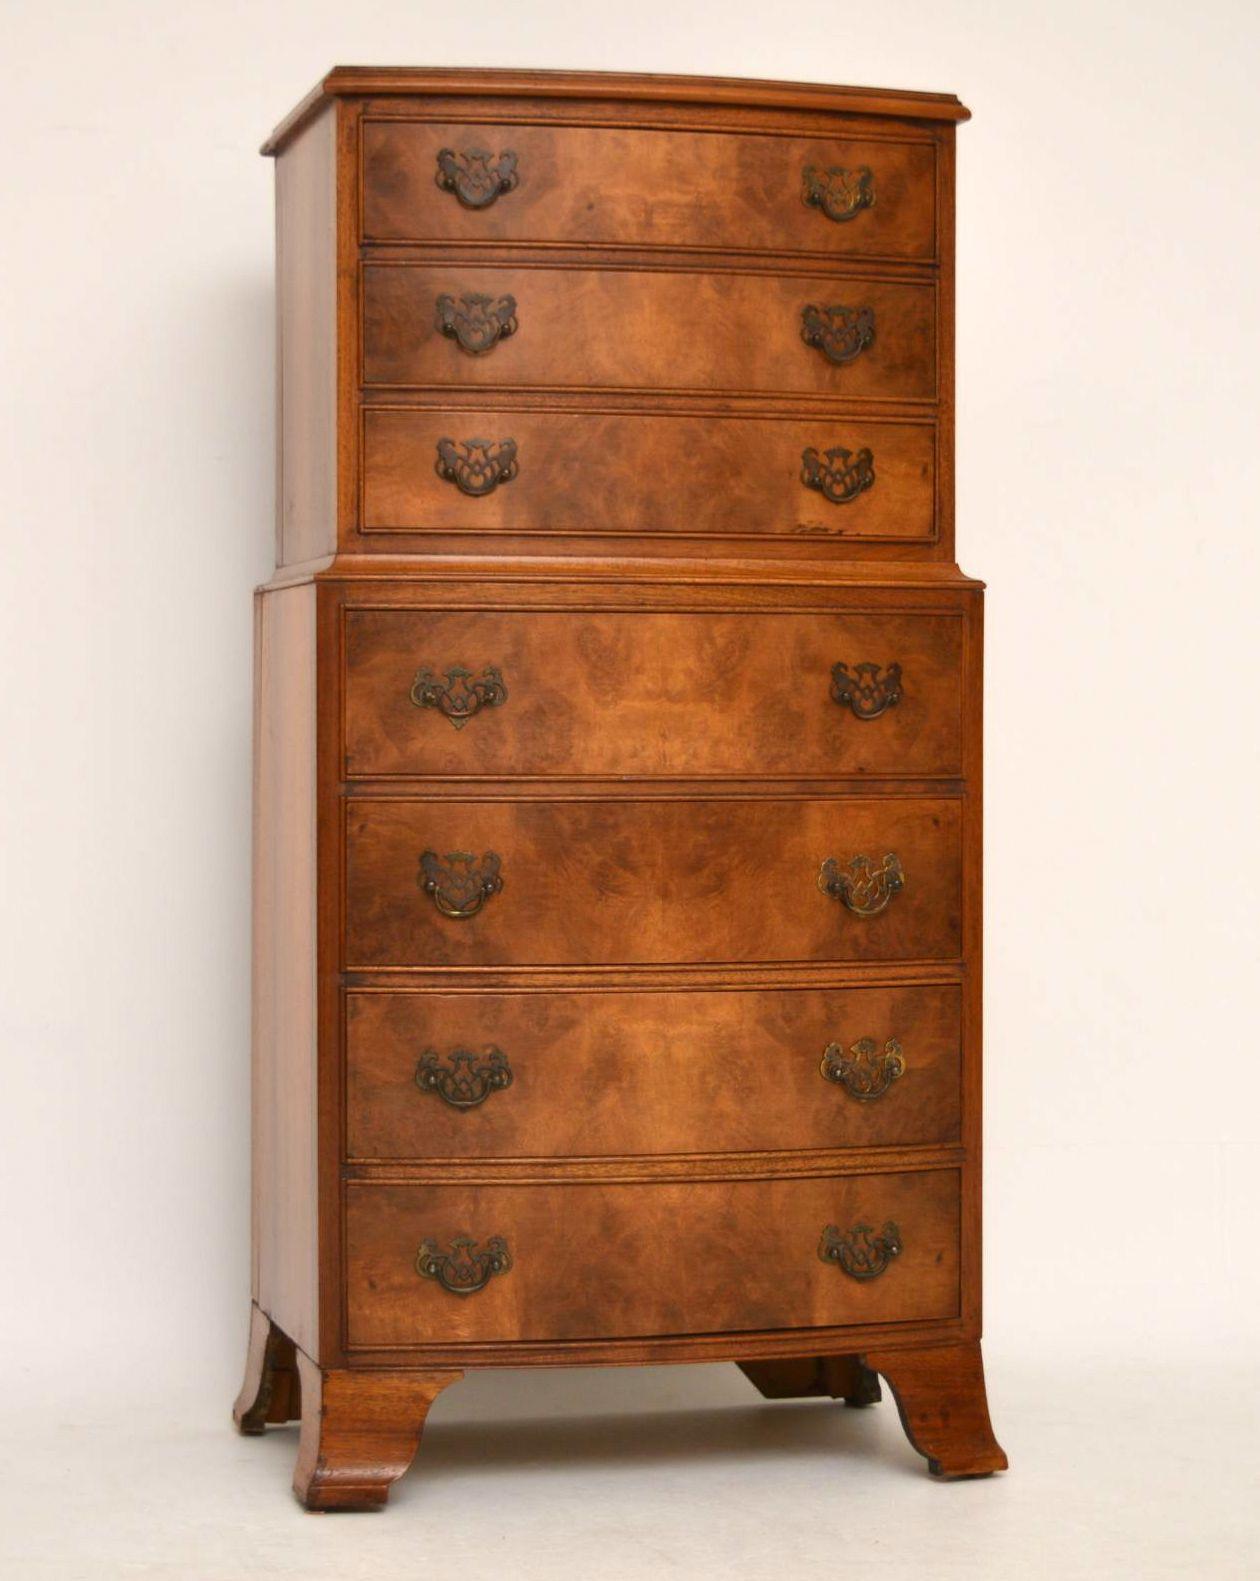 antike georgianische massivholz nussbaum kommode kommoden englische antiquit ten m bel. Black Bedroom Furniture Sets. Home Design Ideas